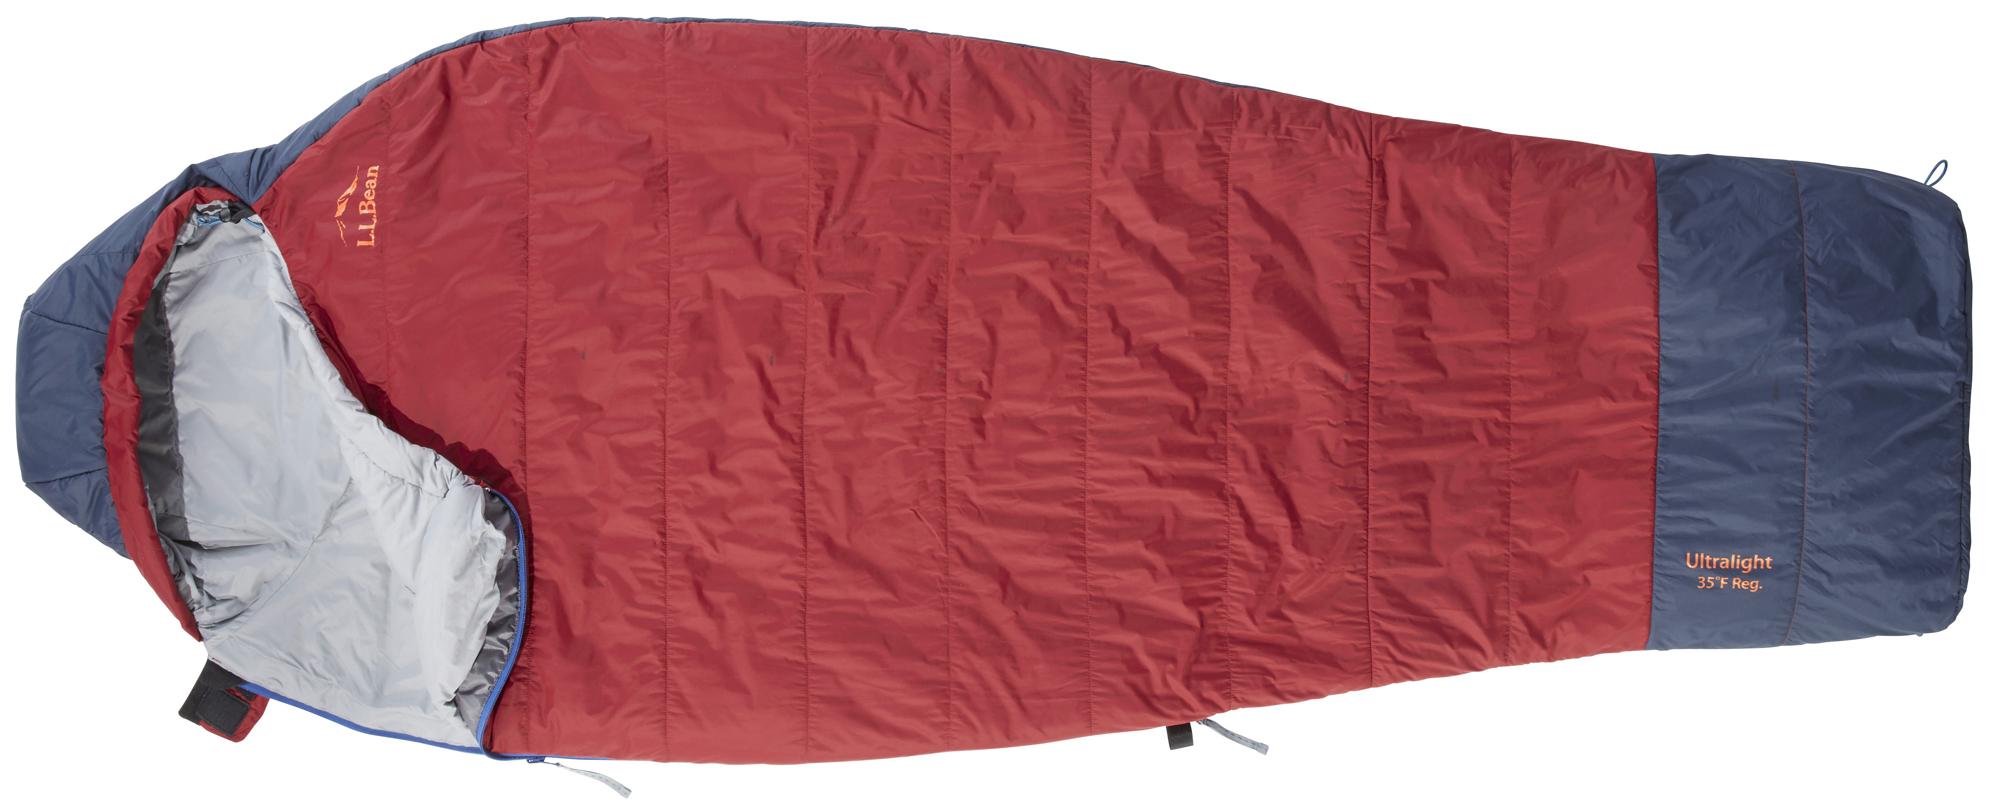 L L Bean Introduces Aerogel Insulated Sleeping Bag